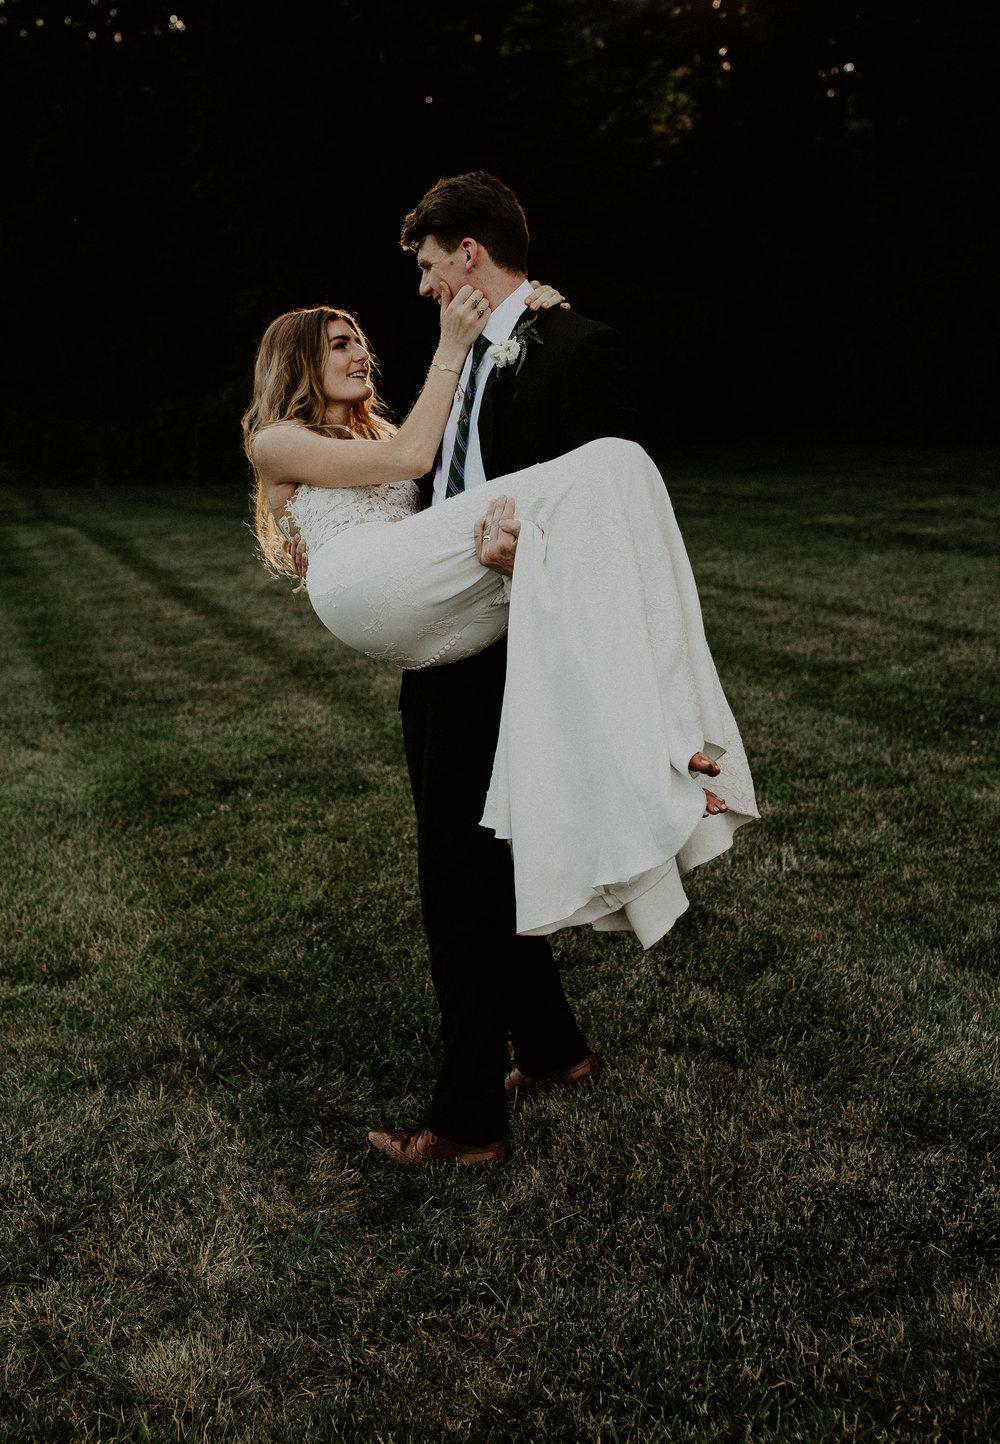 Mariemont_Chapel_Cincinnati_Wedding_Hannah_Nick-EDIT-724.JPG